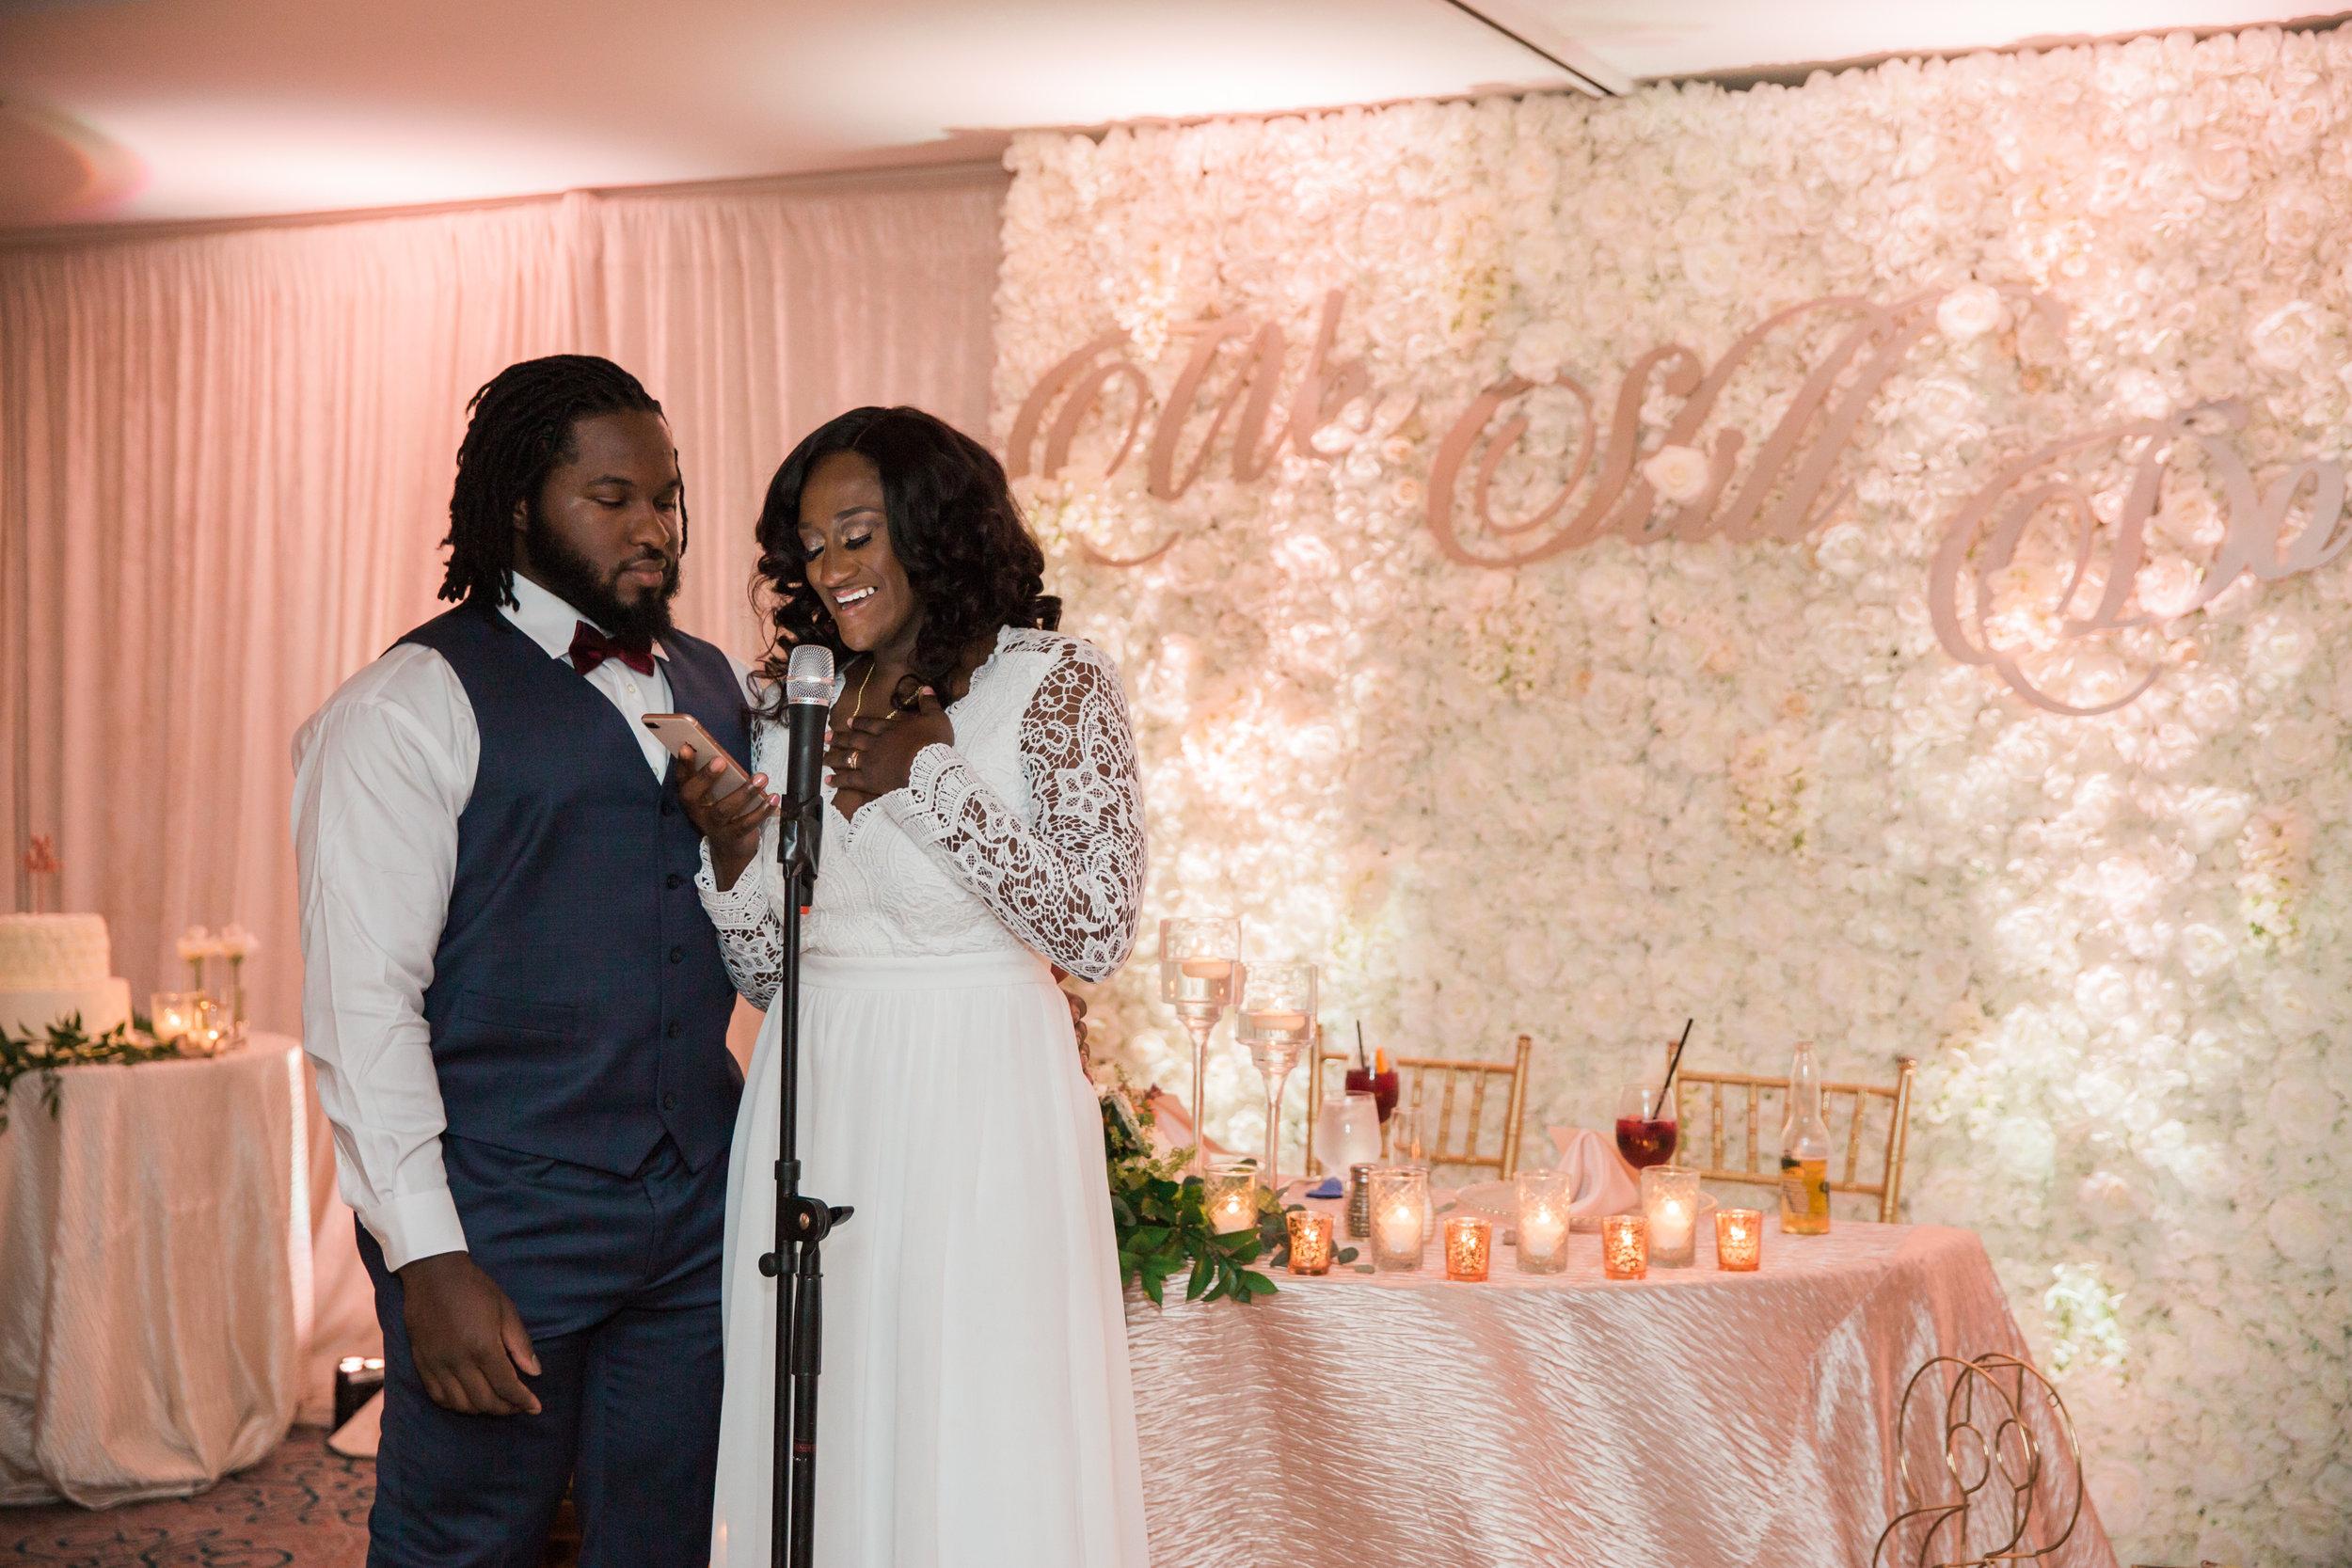 Baltimore City Wedding at Hotel Indigo Megapixels Media Photography Tira Lynn Events Black Bride and Groom (50 of 74).jpg